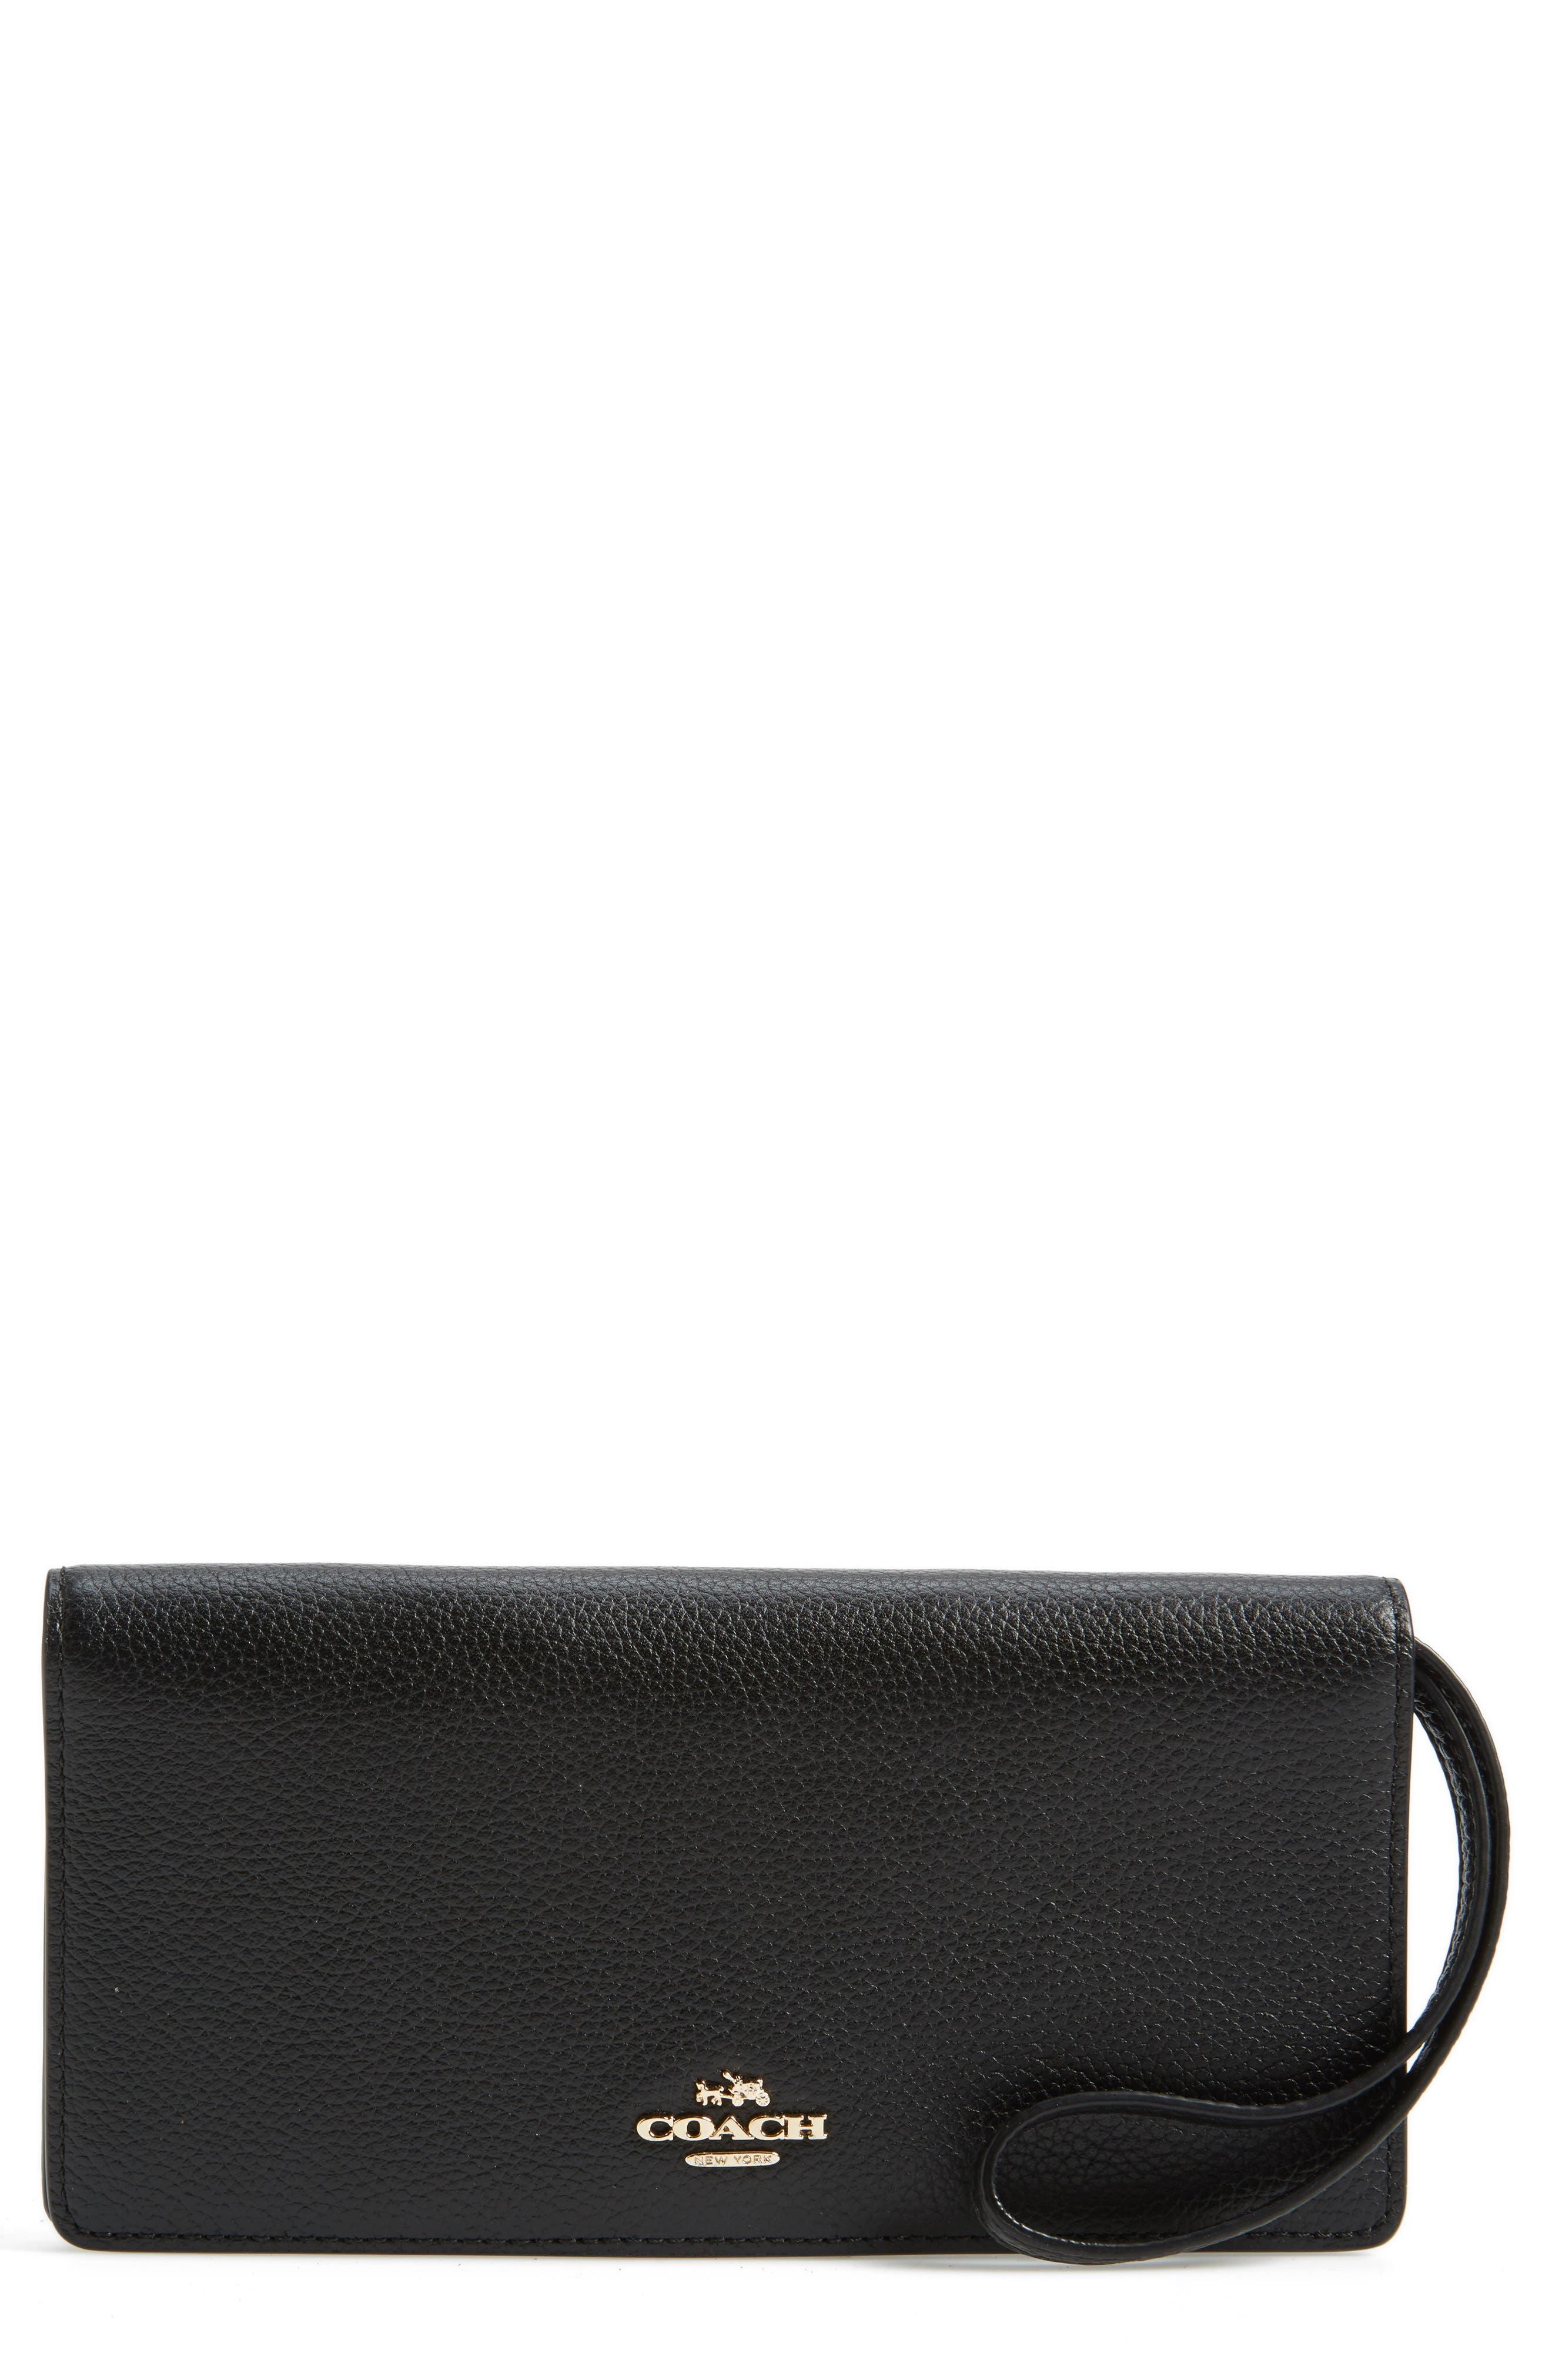 Alternate Image 1 Selected - COACH Slim Calfskin Leather Wristlet